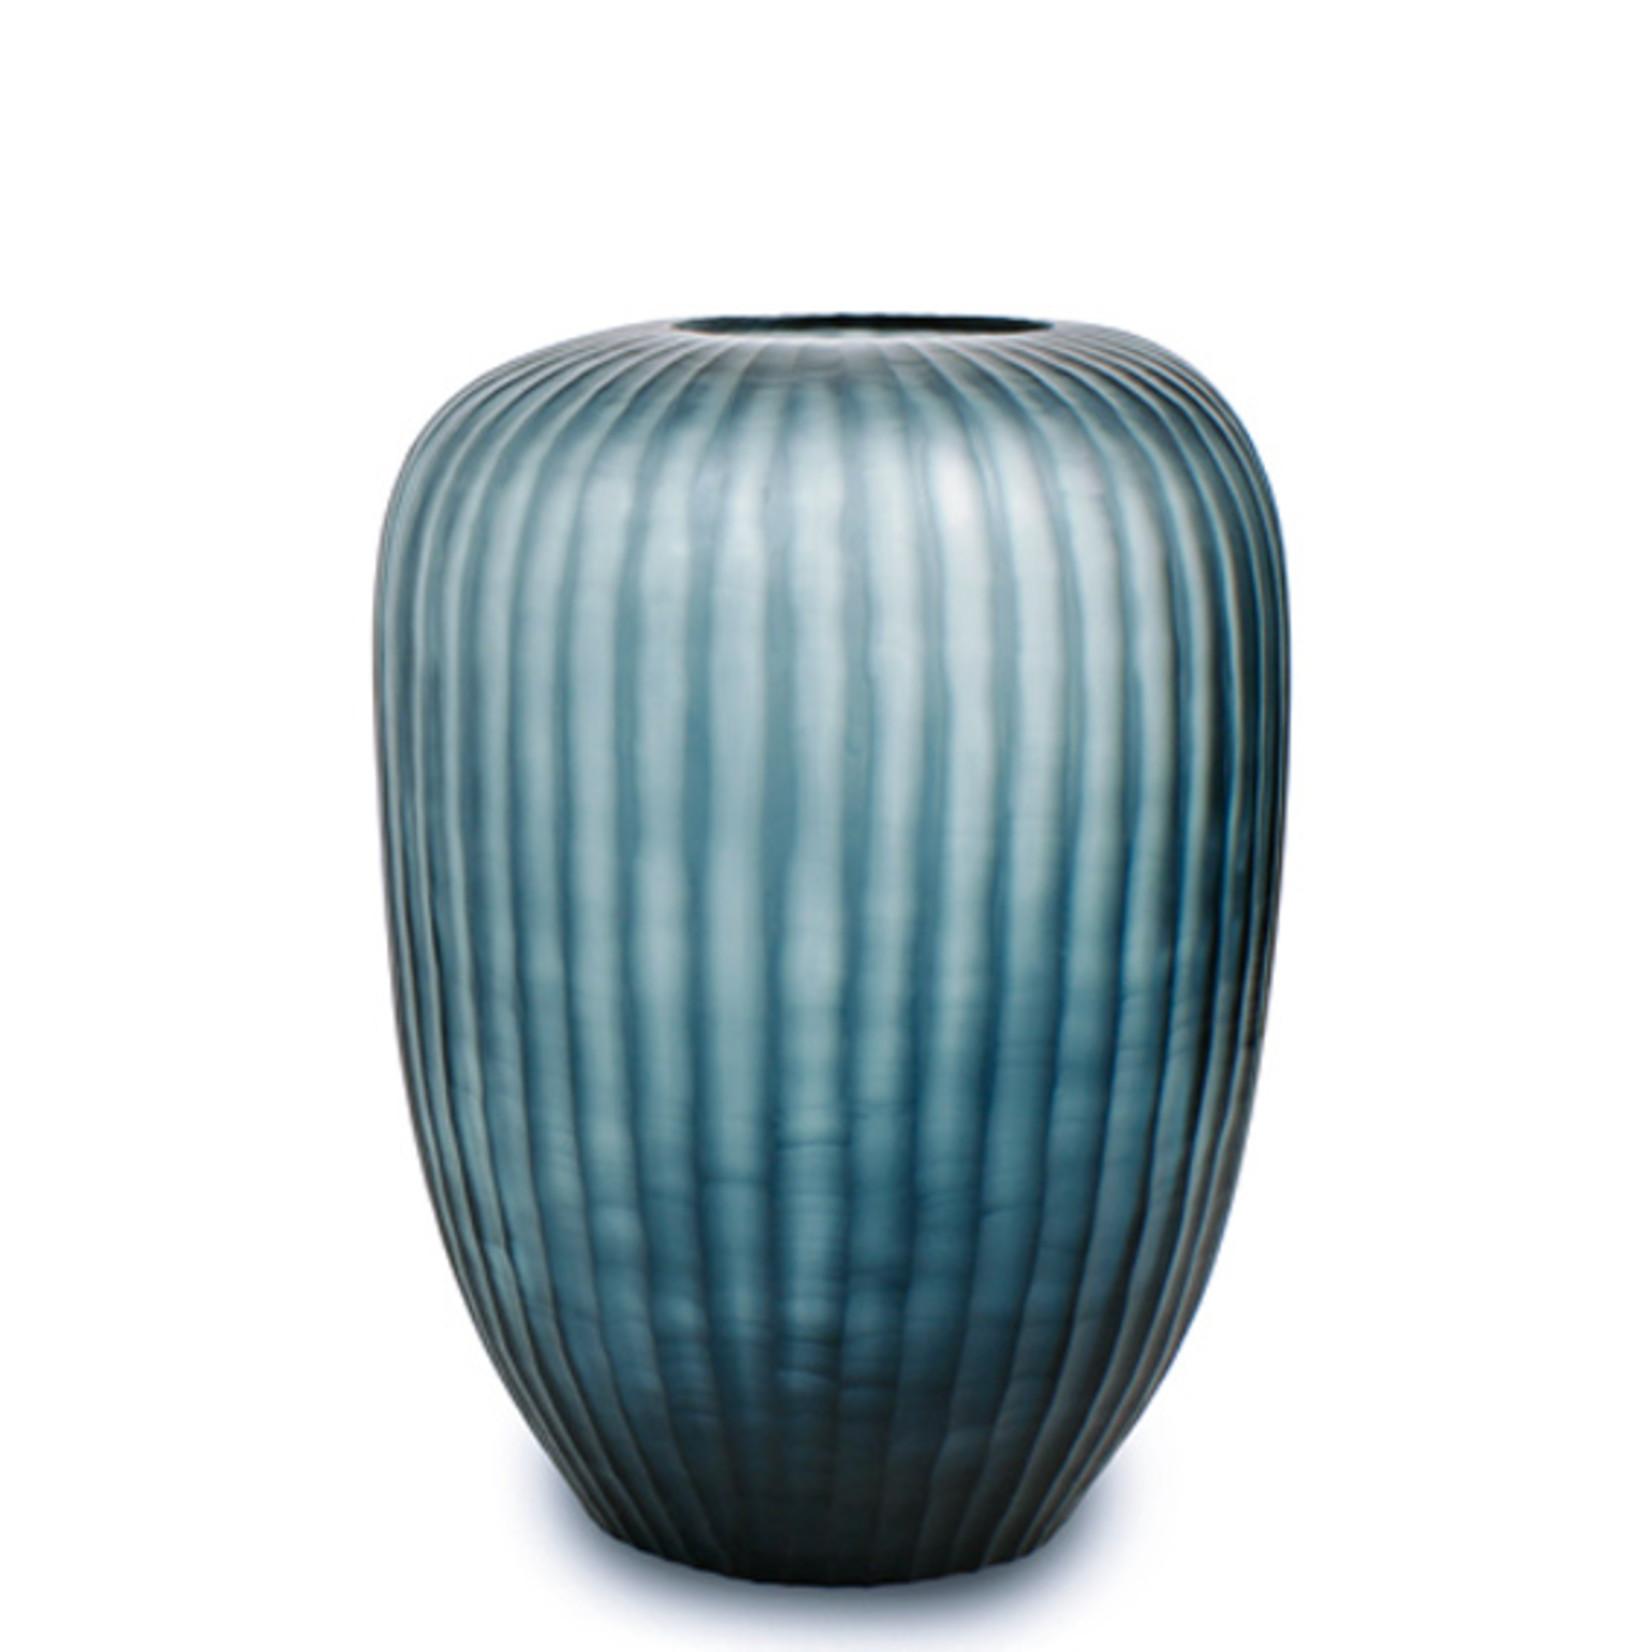 Guaxs Vaas Gobi Tall | Ocean Blue / Indigo